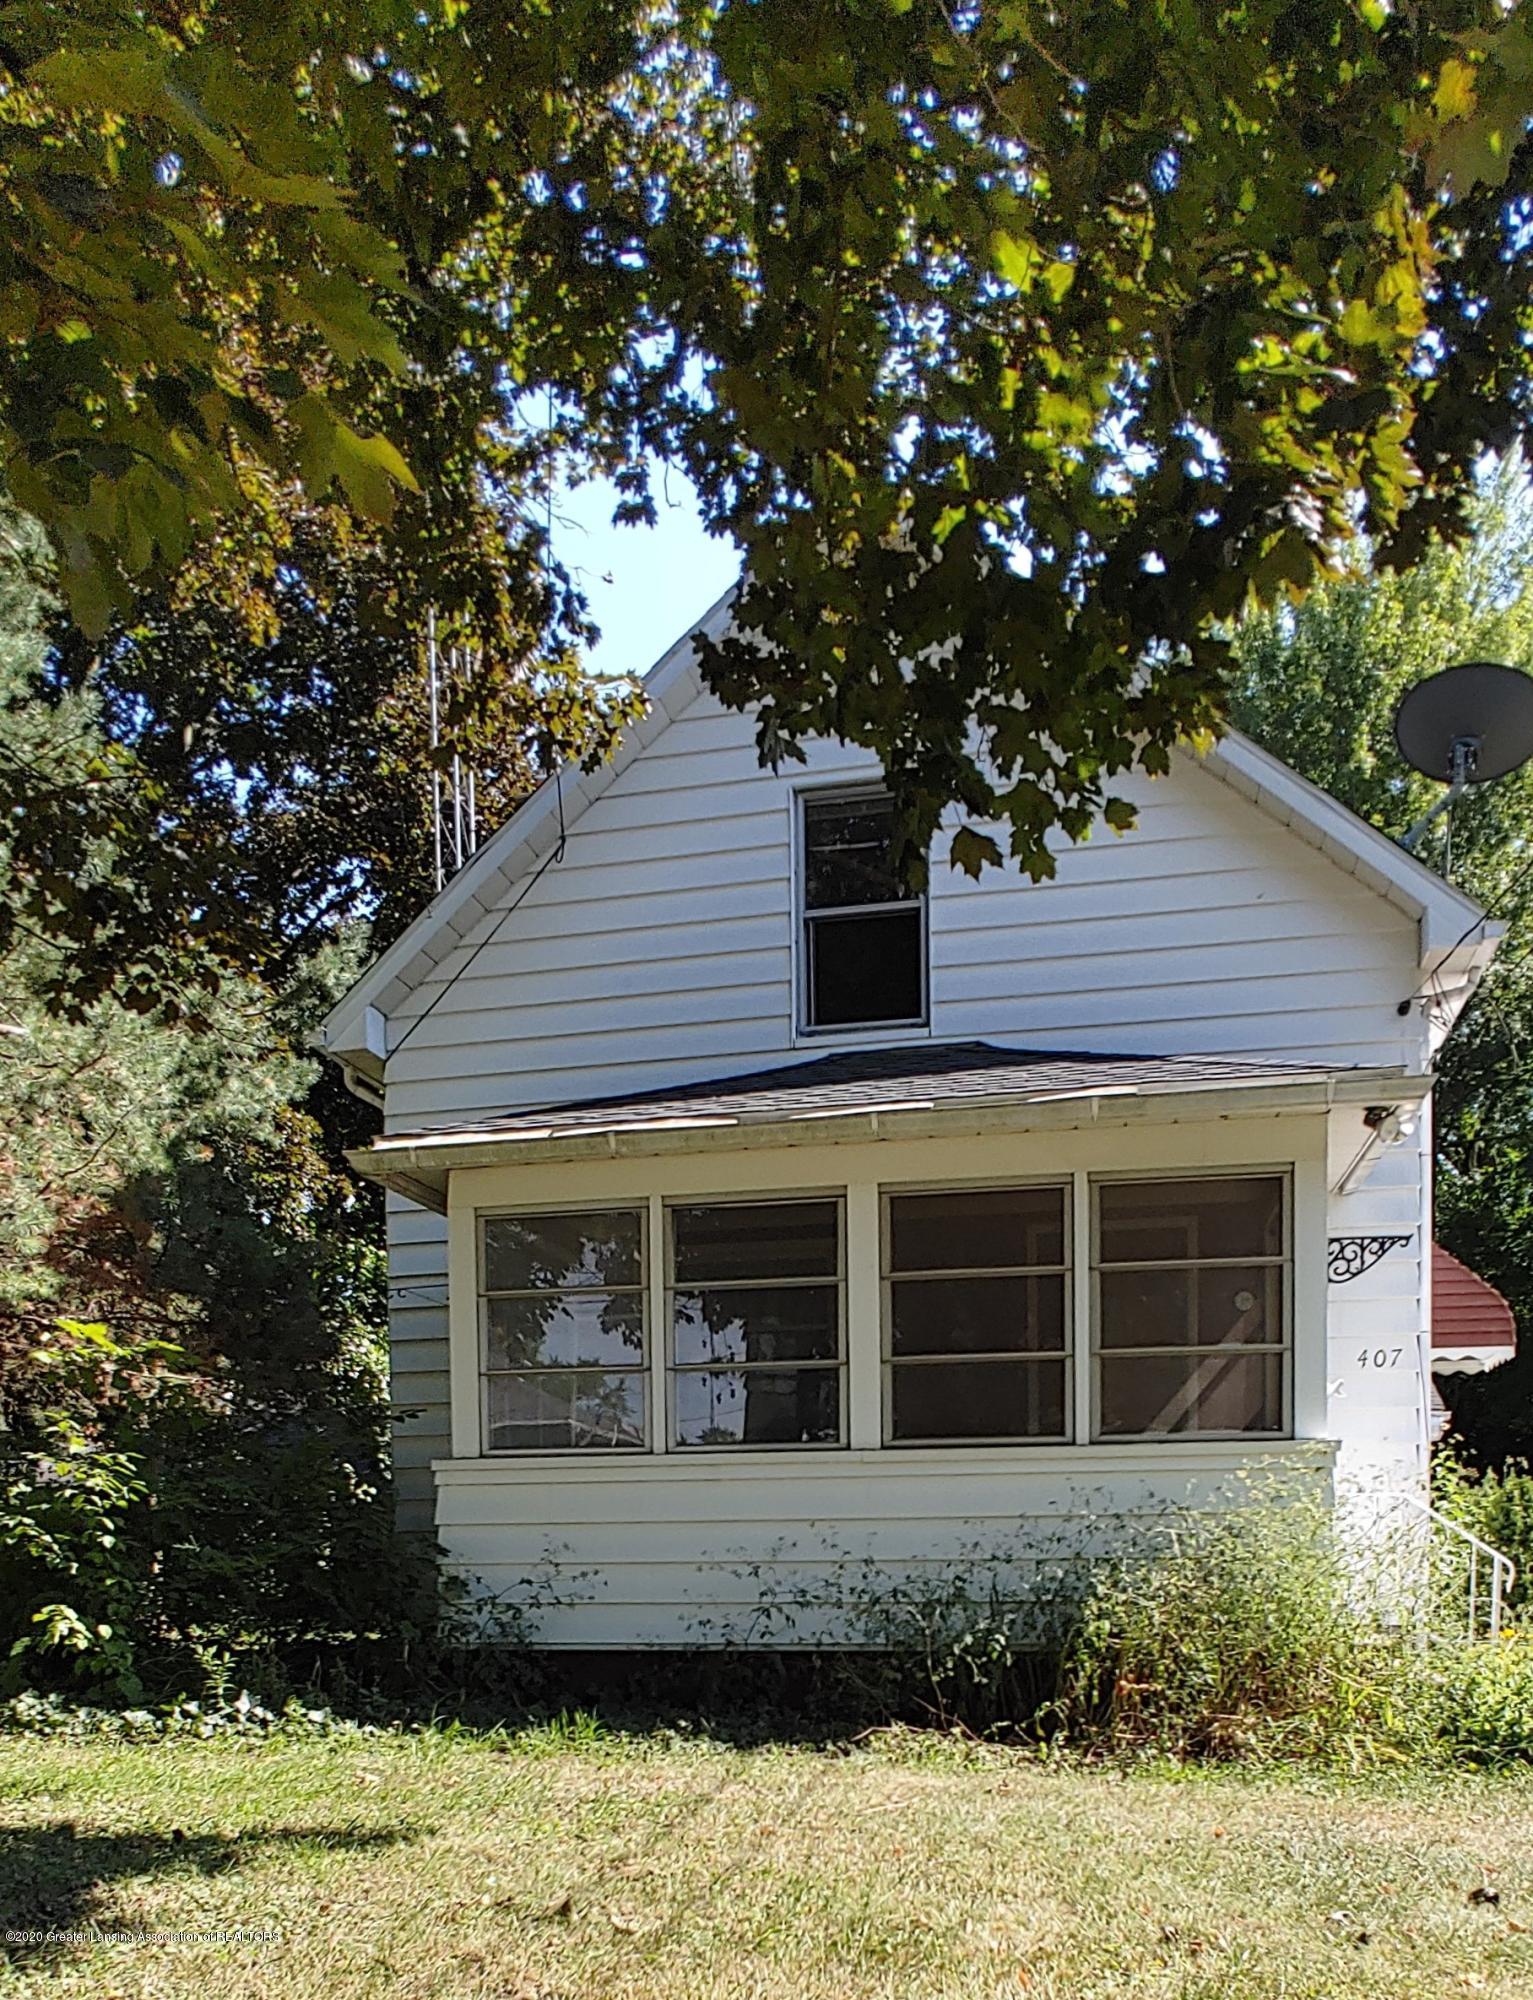 407 Bloomfield Blvd - Home - 25